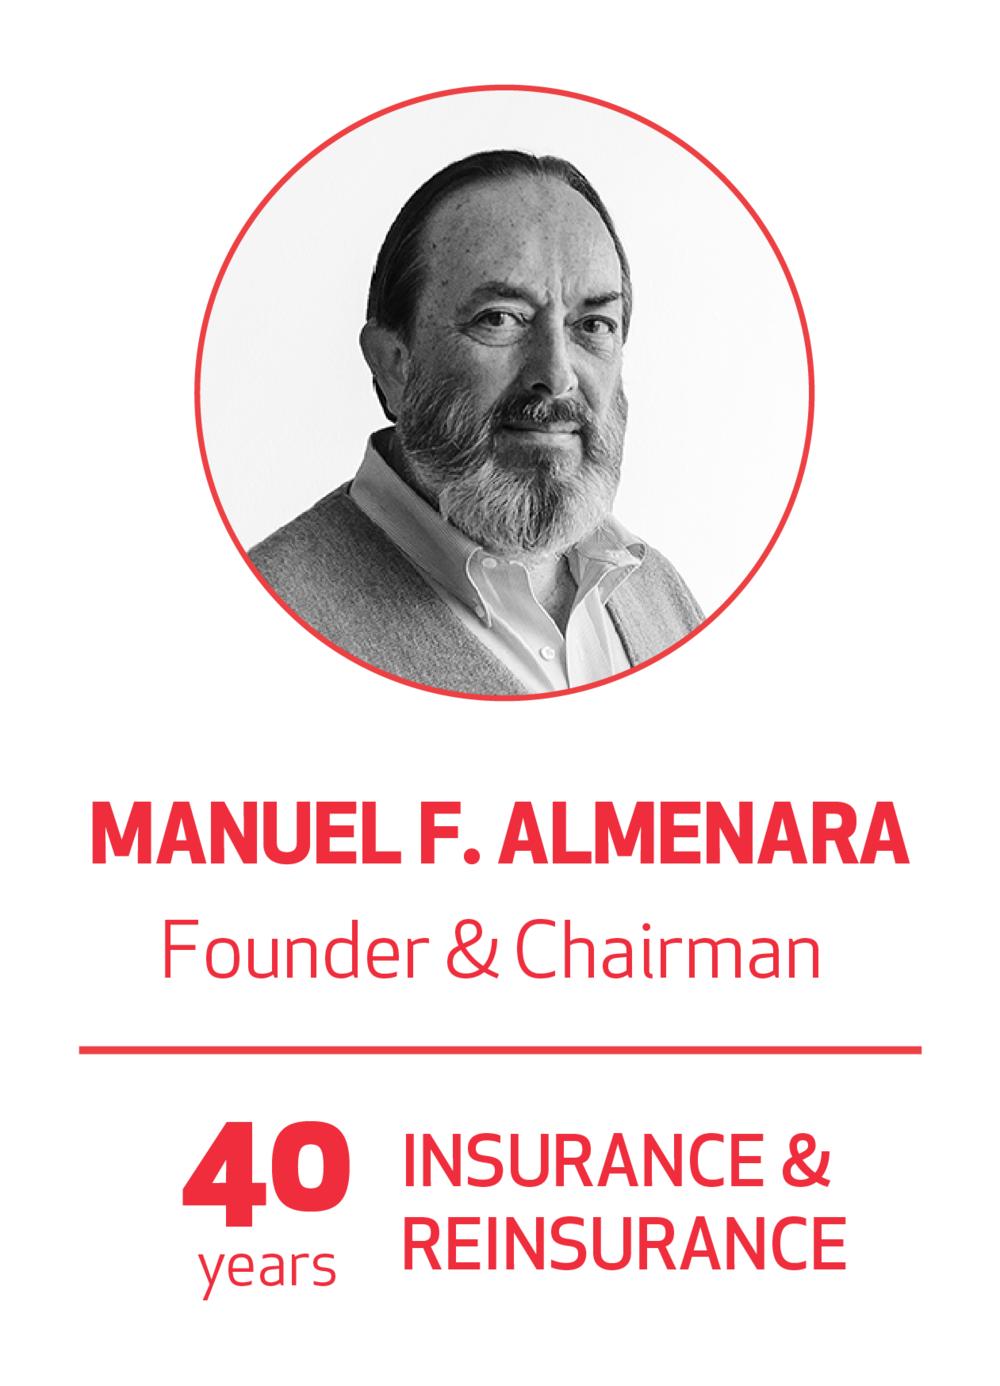 Manuel F. Almenara